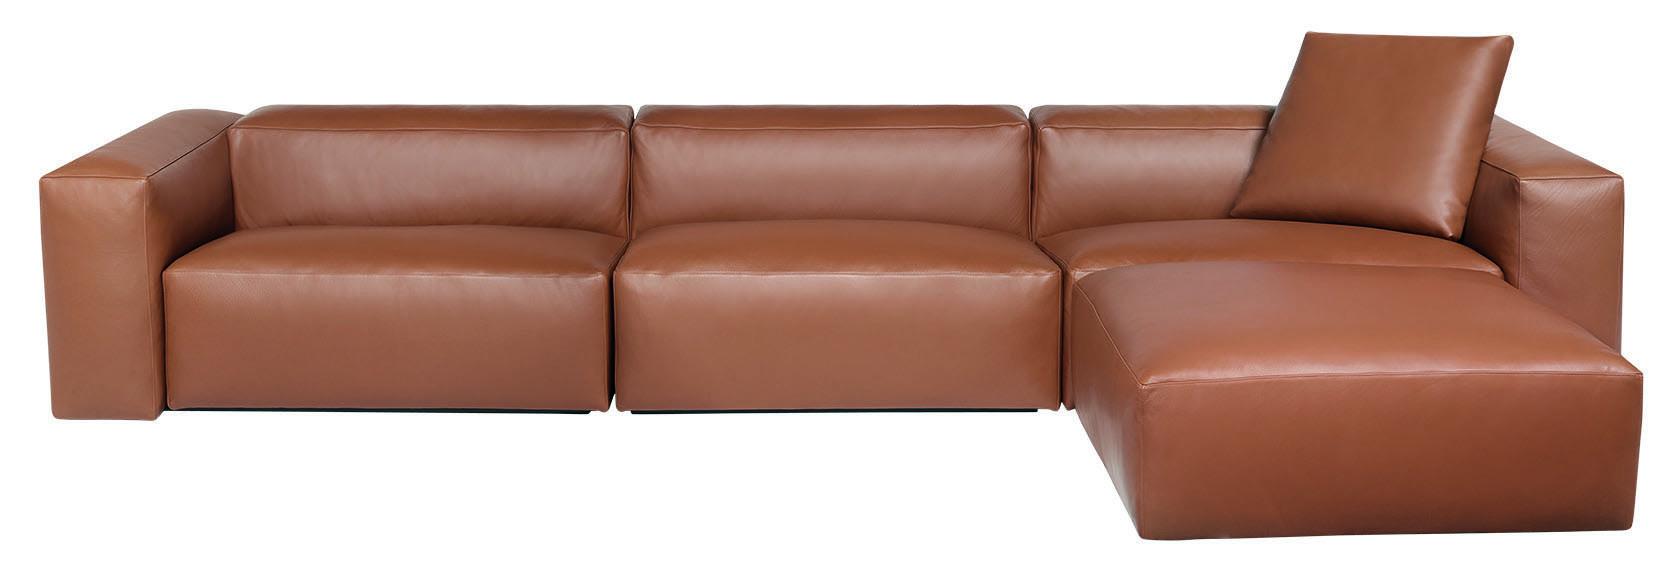 Aspettami Sectional Leather Luxury Indoor Sofa